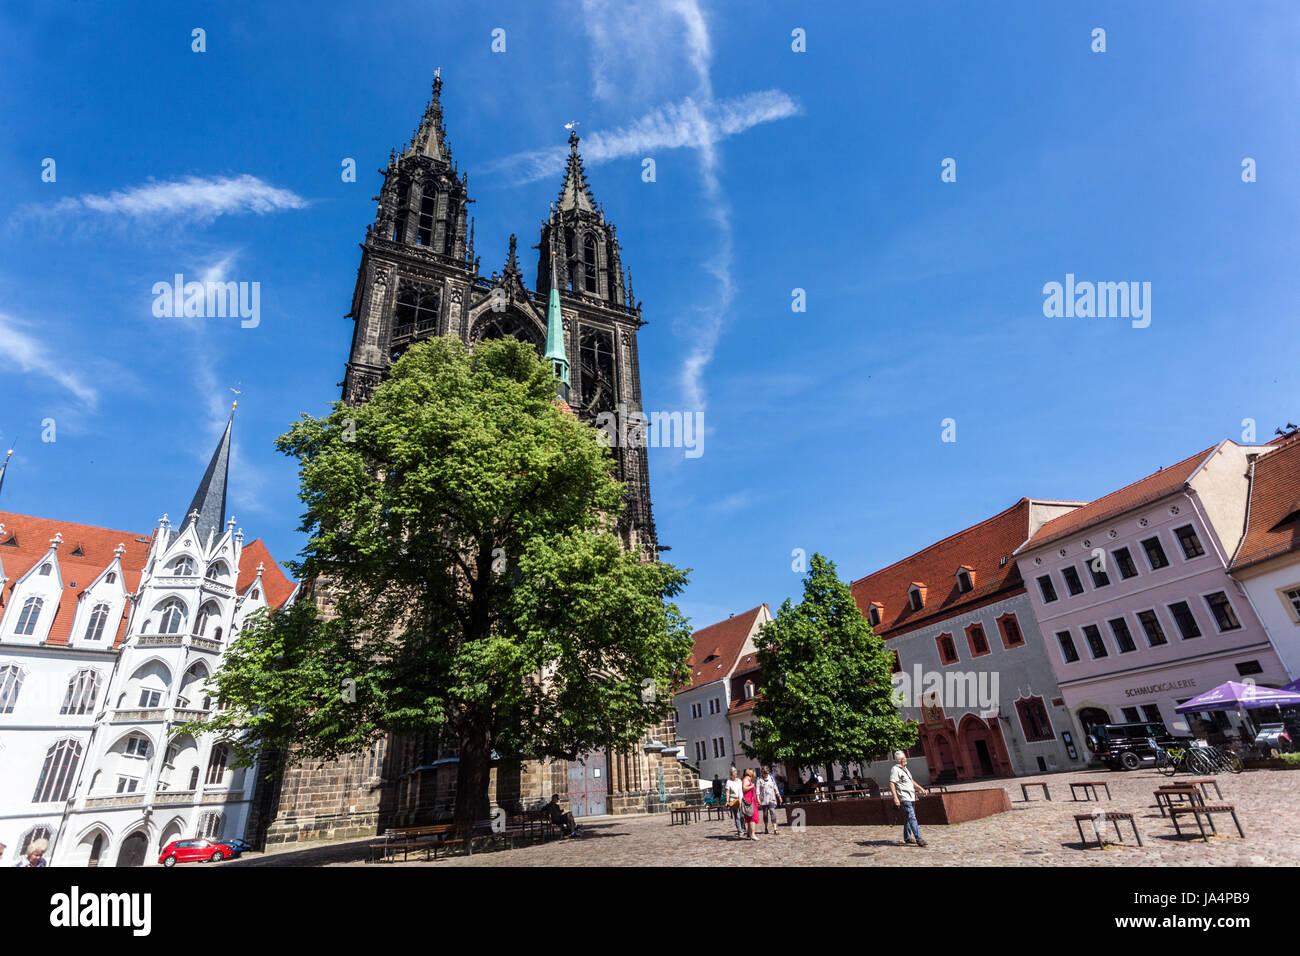 Domplatz, Meissen, Sachsen, Europa Stockbild